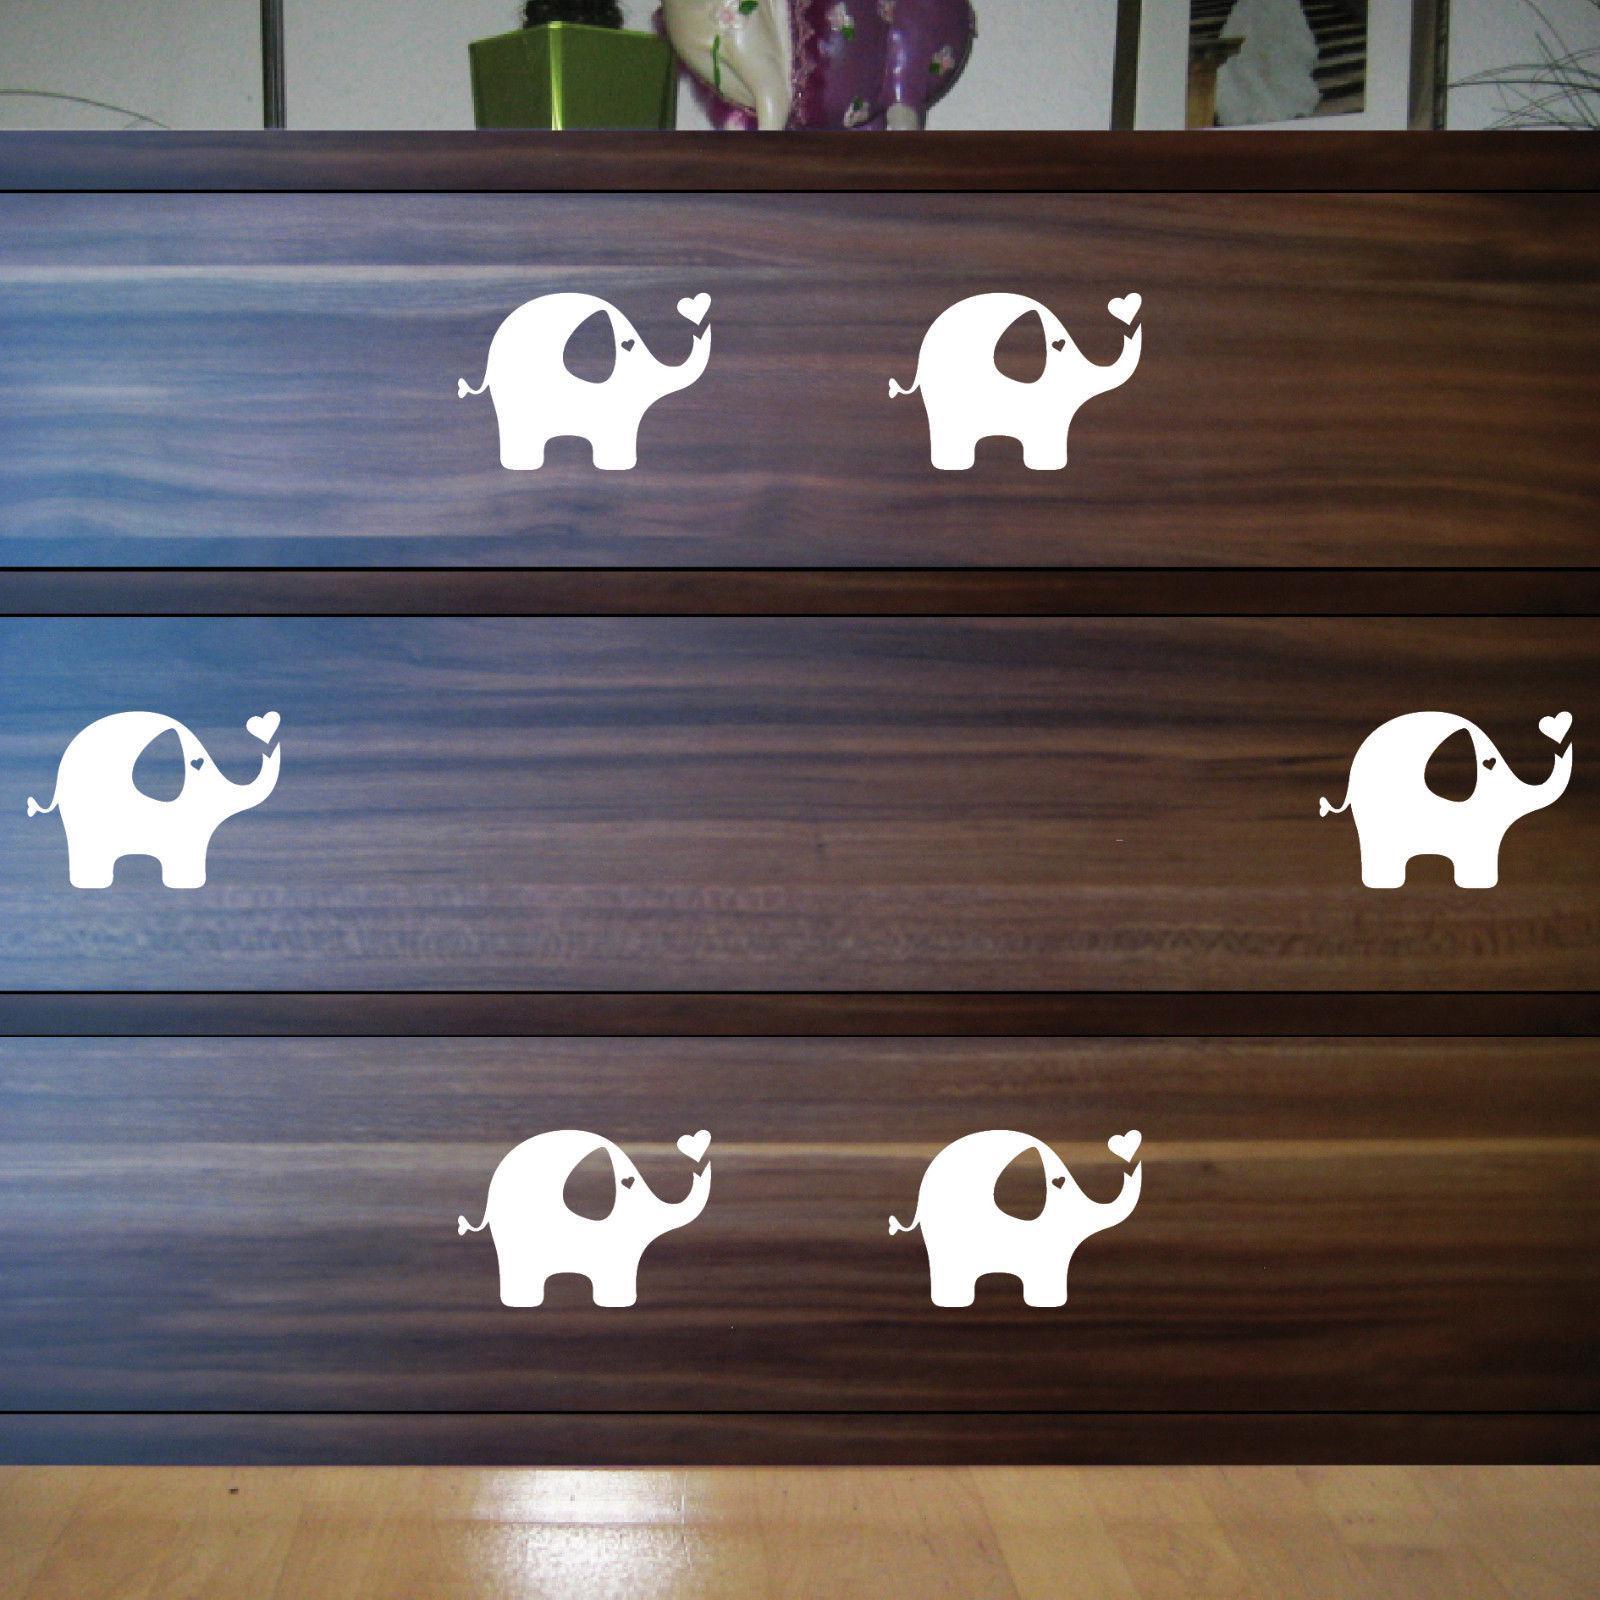 6 aufkleber tattoo elefant wei 10cm dumbo deko folie kinderzimmer m bel fenster kaufen bei. Black Bedroom Furniture Sets. Home Design Ideas